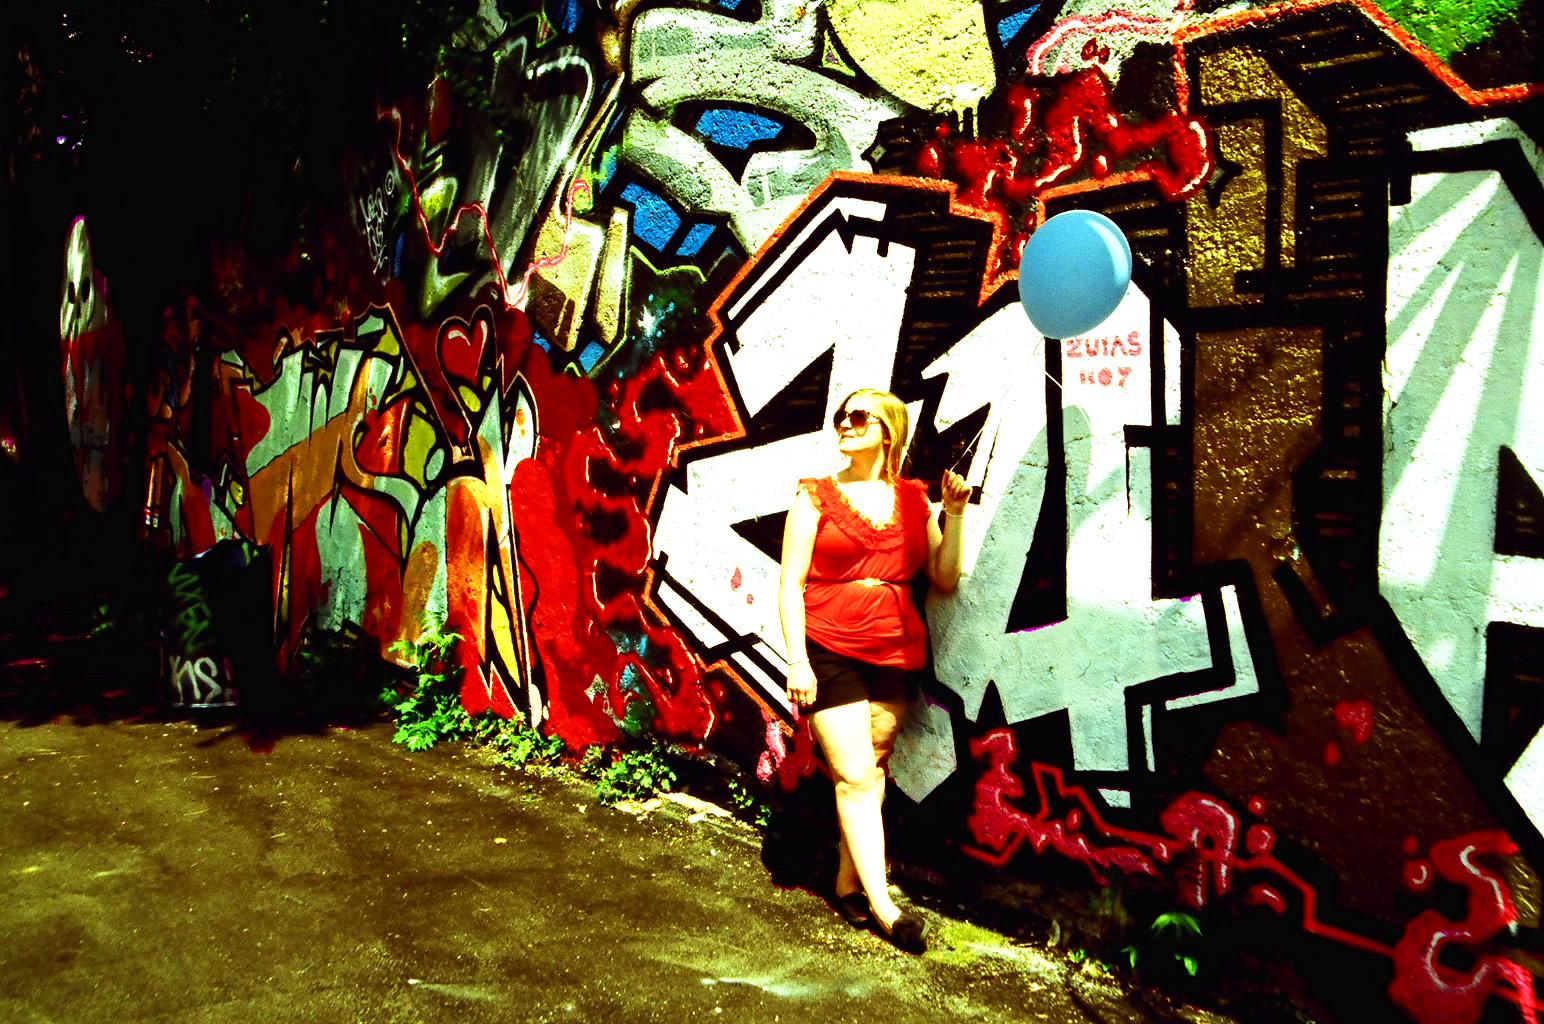 Metelkova graffiti